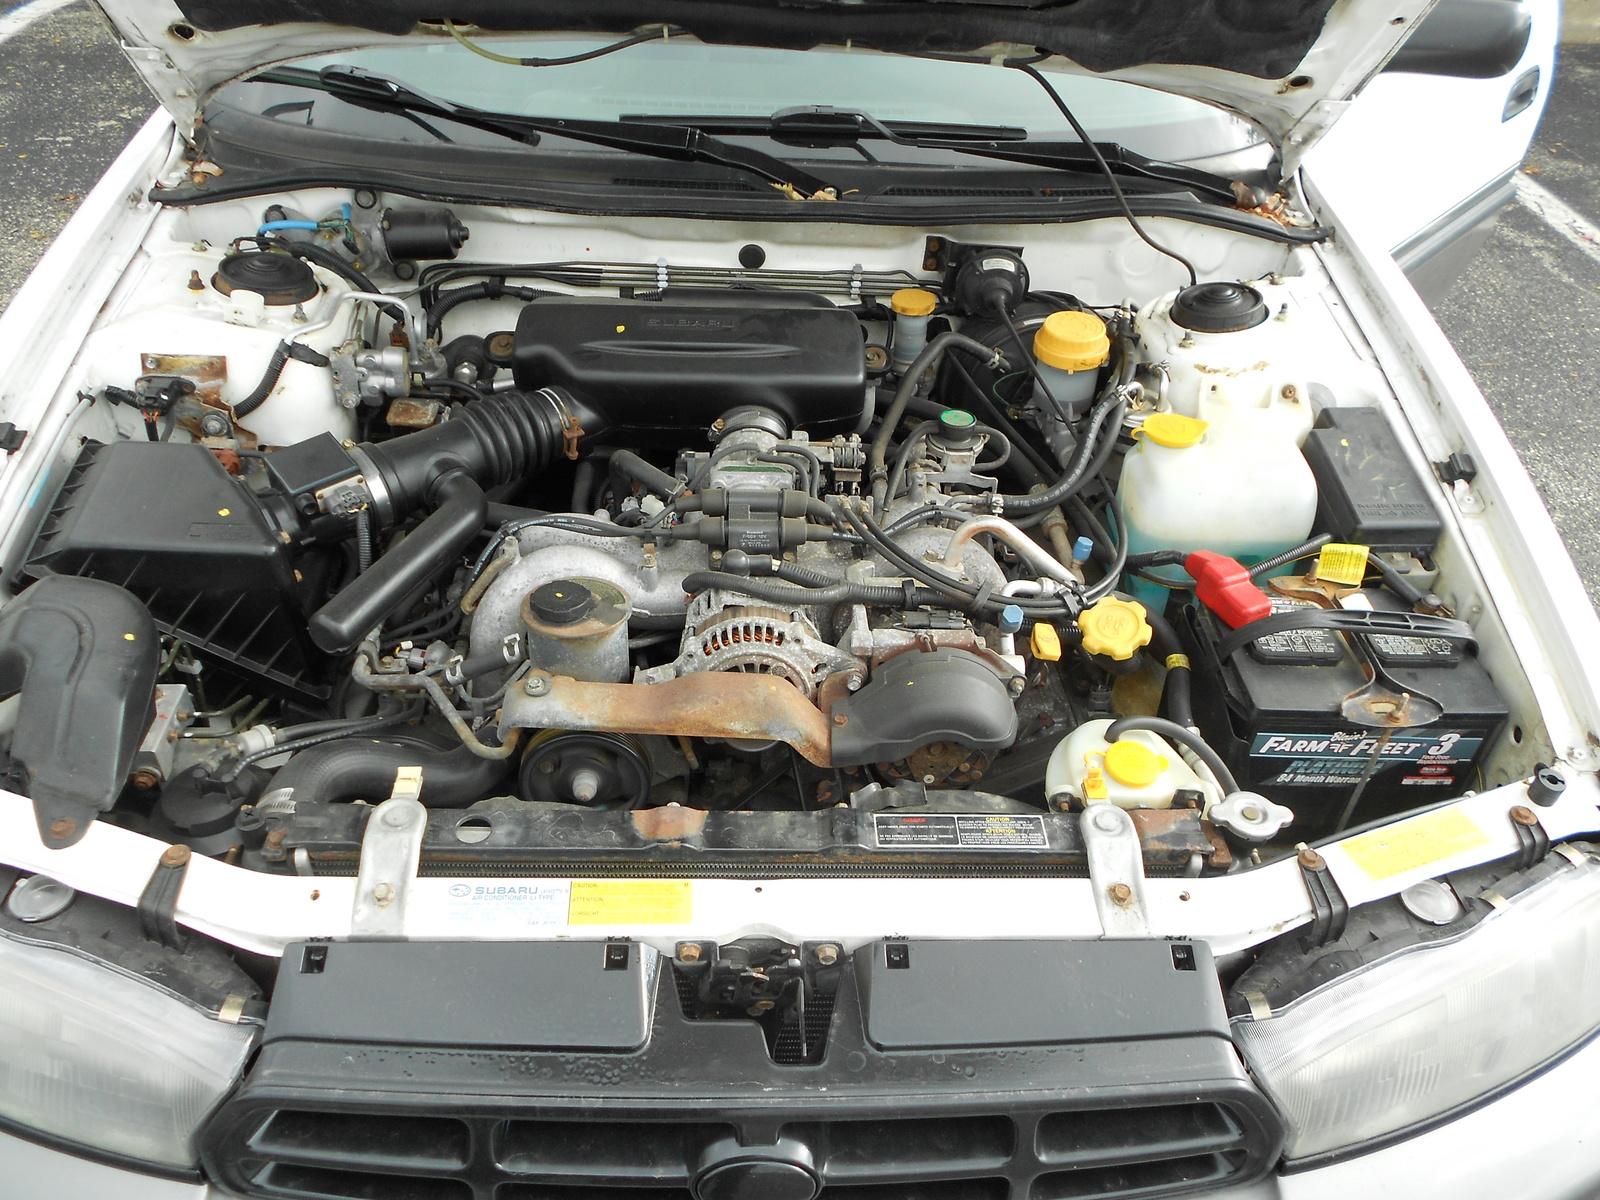 1997 Subaru Impreza Brighton1997 Pictures Cargurus Legacy Gtb Wiring Diagram